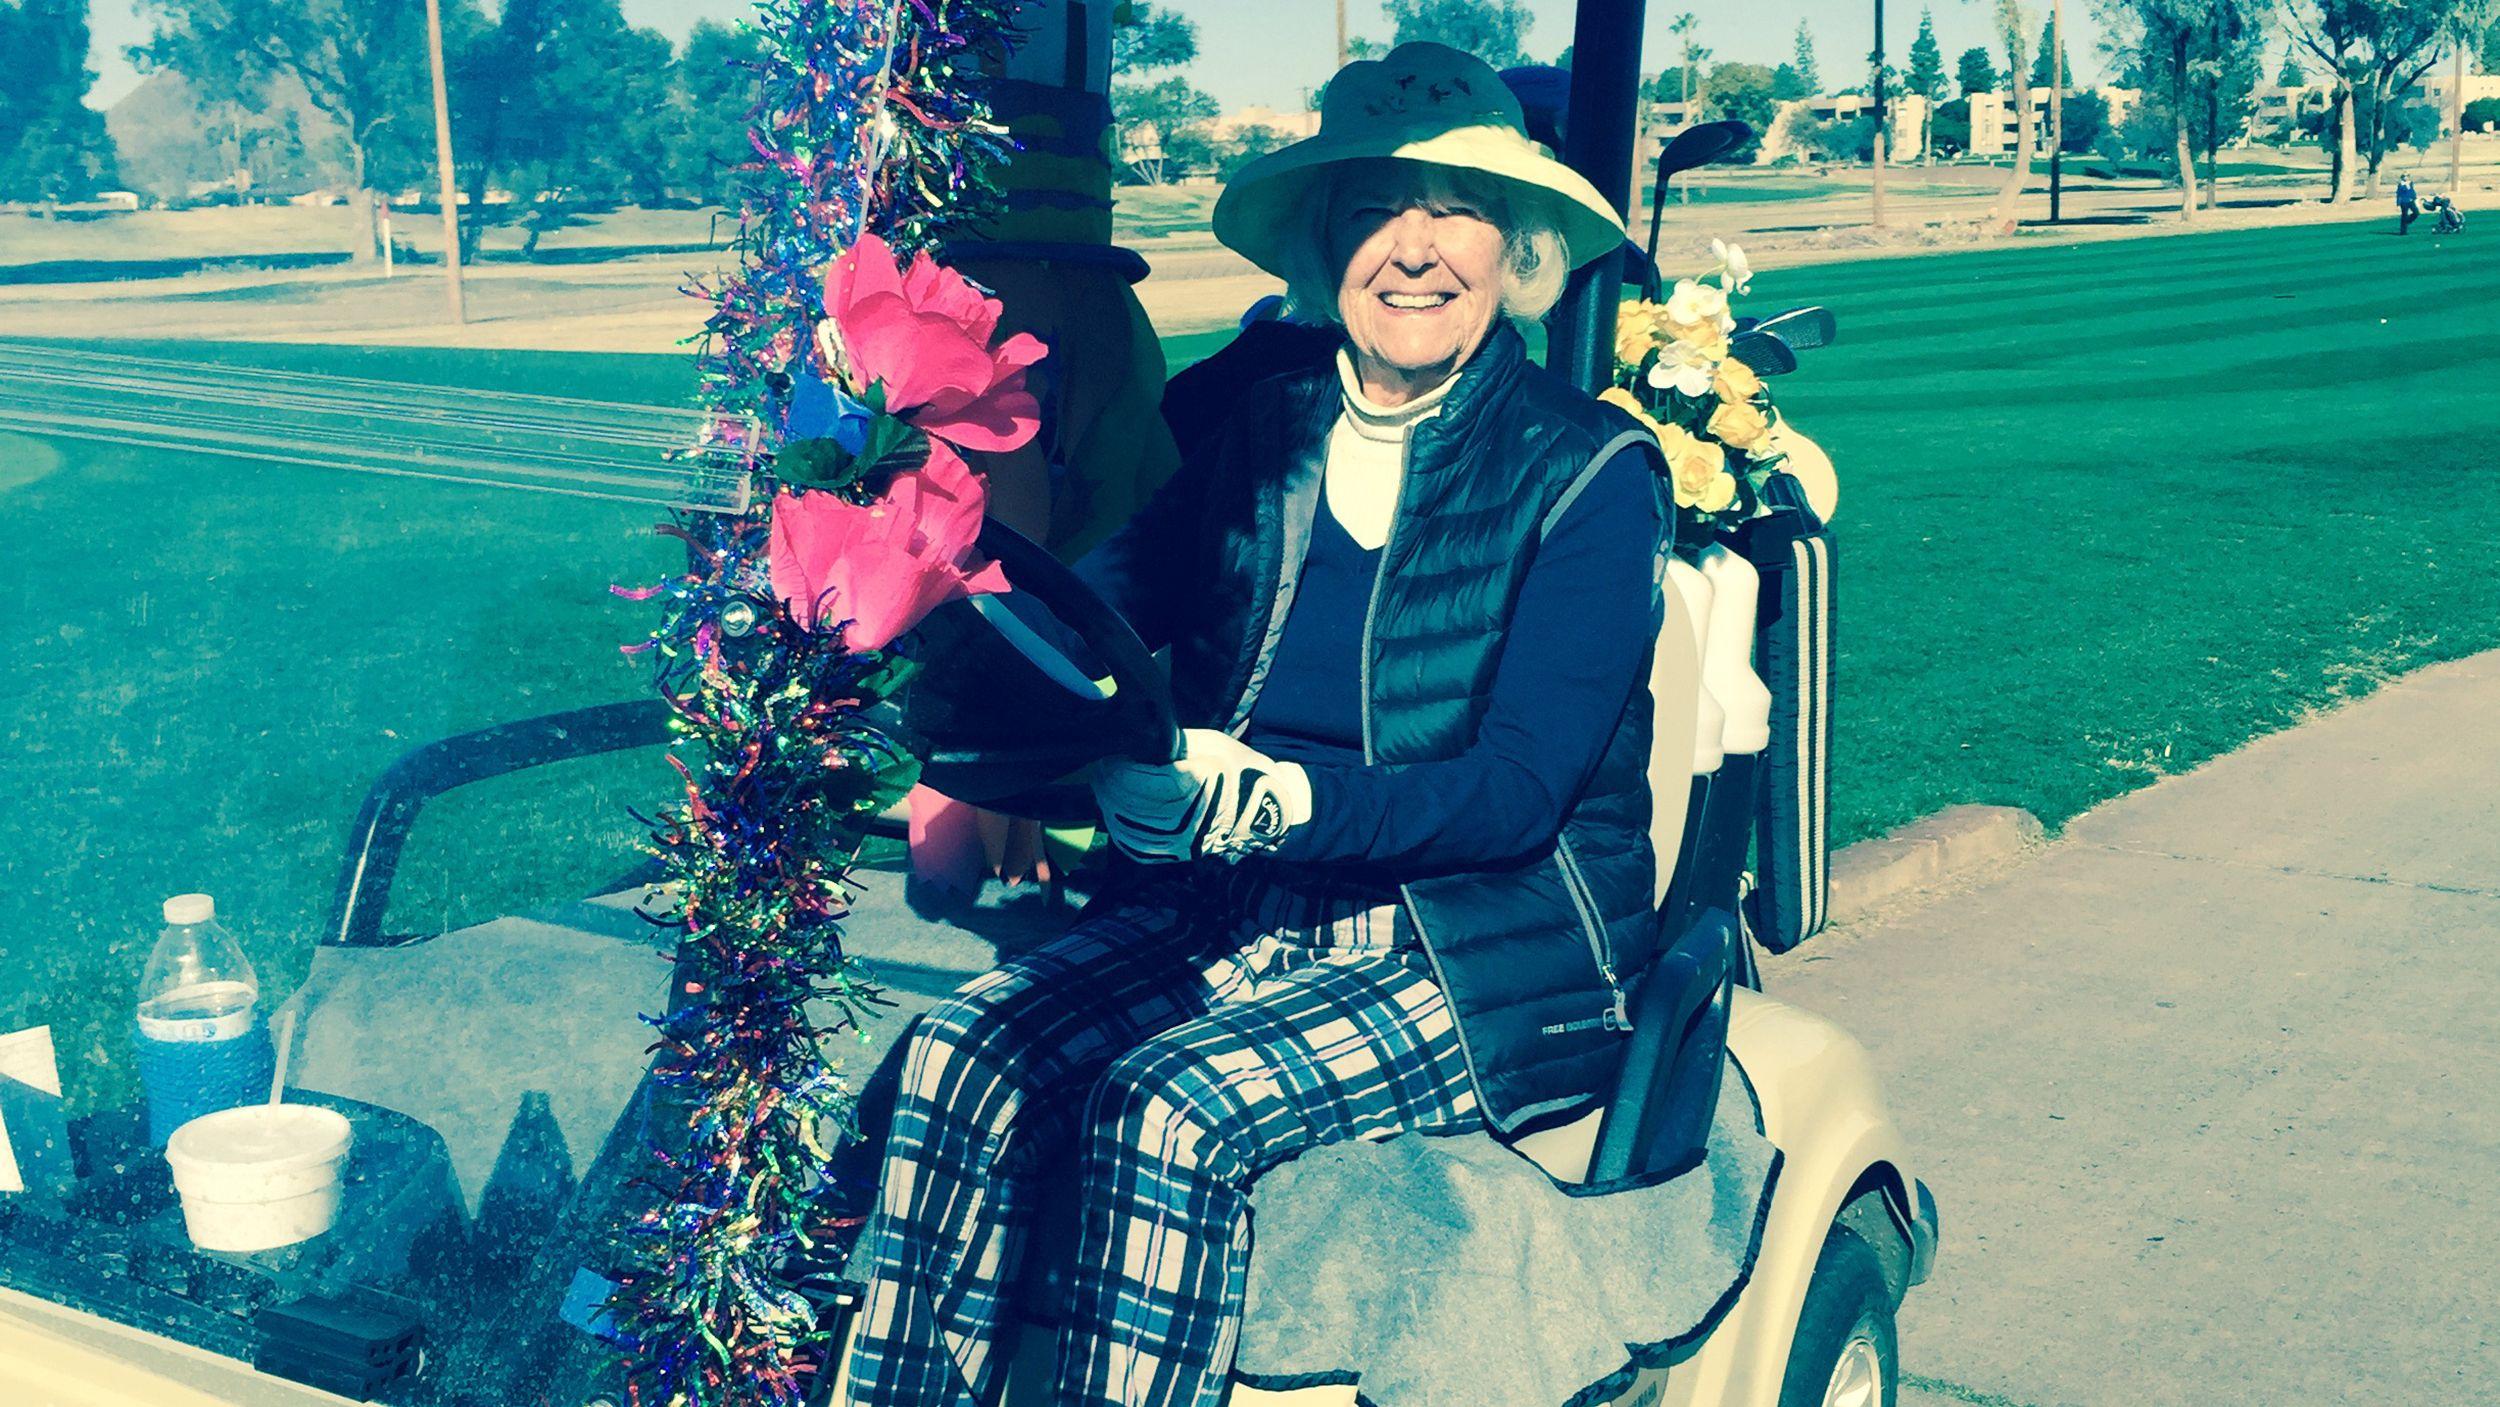 I Enjoy Life Every Day 100 Year Old Golfer S Secret To Living Longer Enjoy Life Senior Fitness Life